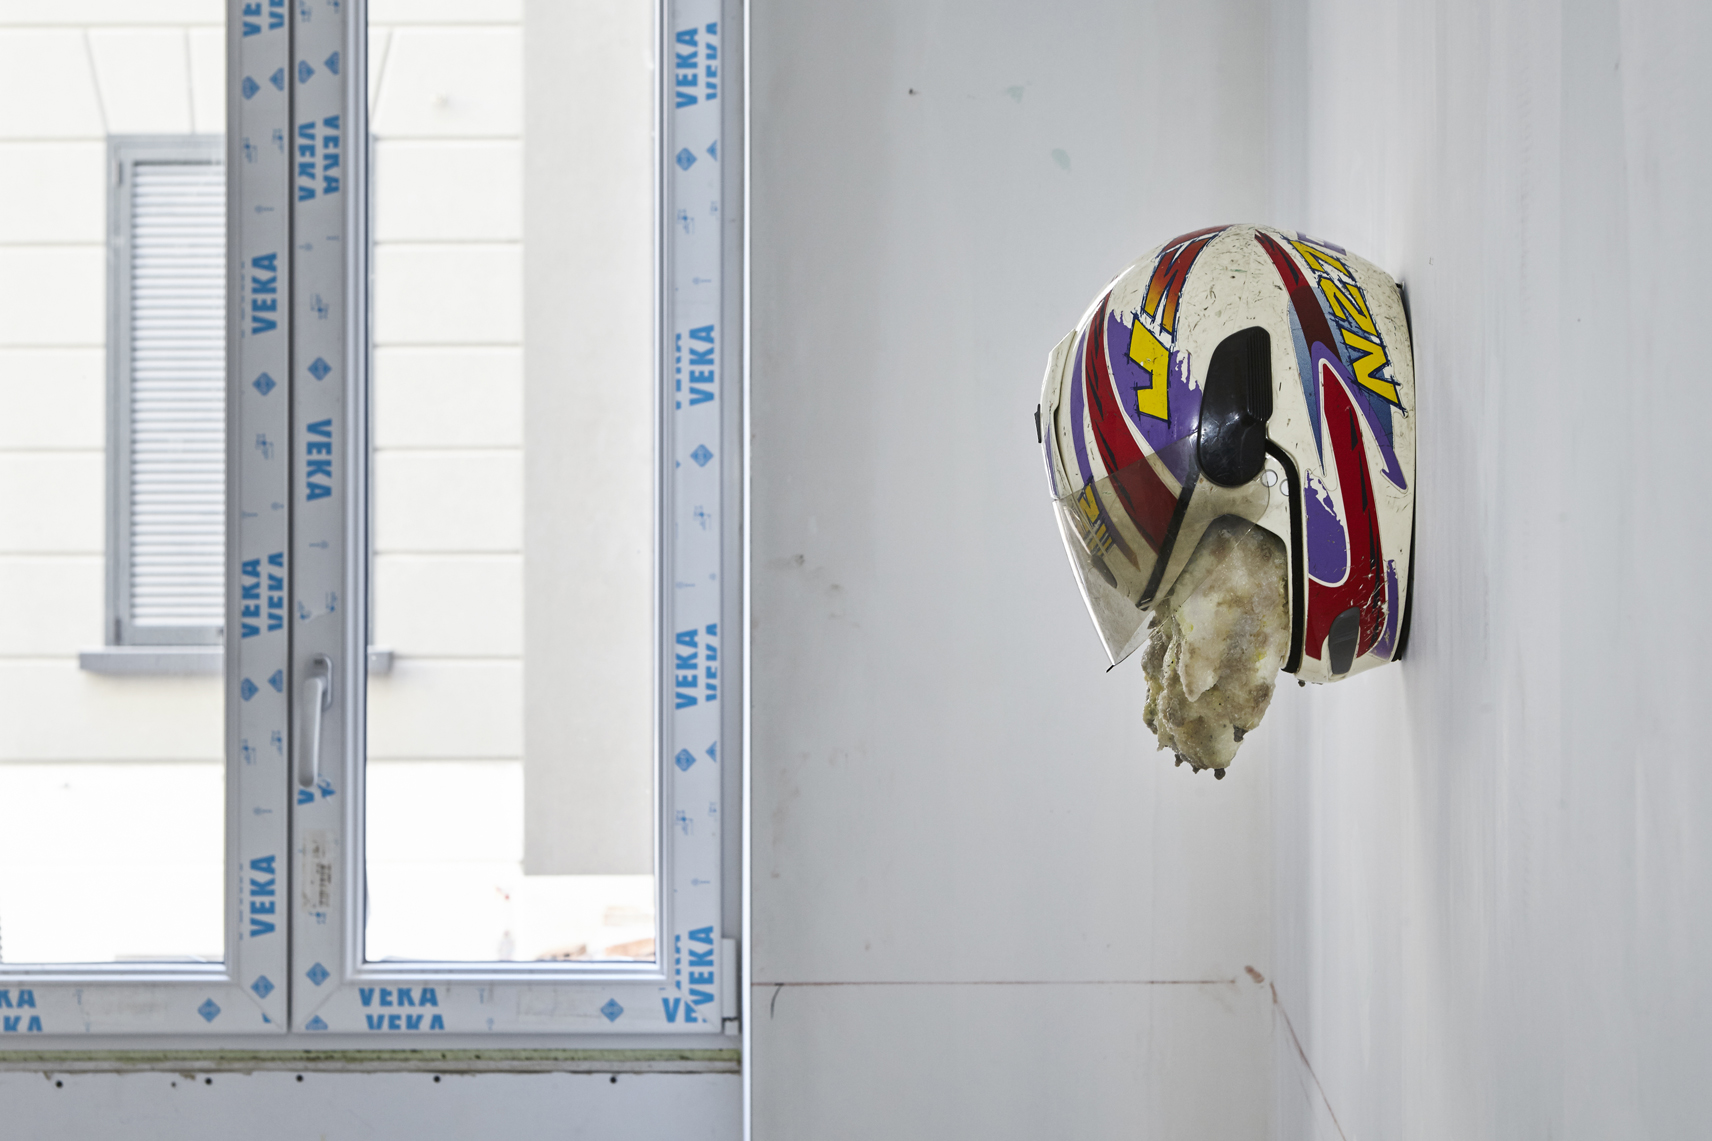 Michele Gabriele, Terzo Piano a sinistra, Installation view, FuturDome Milano, agosto 2016, ph. Floriana Giacinti